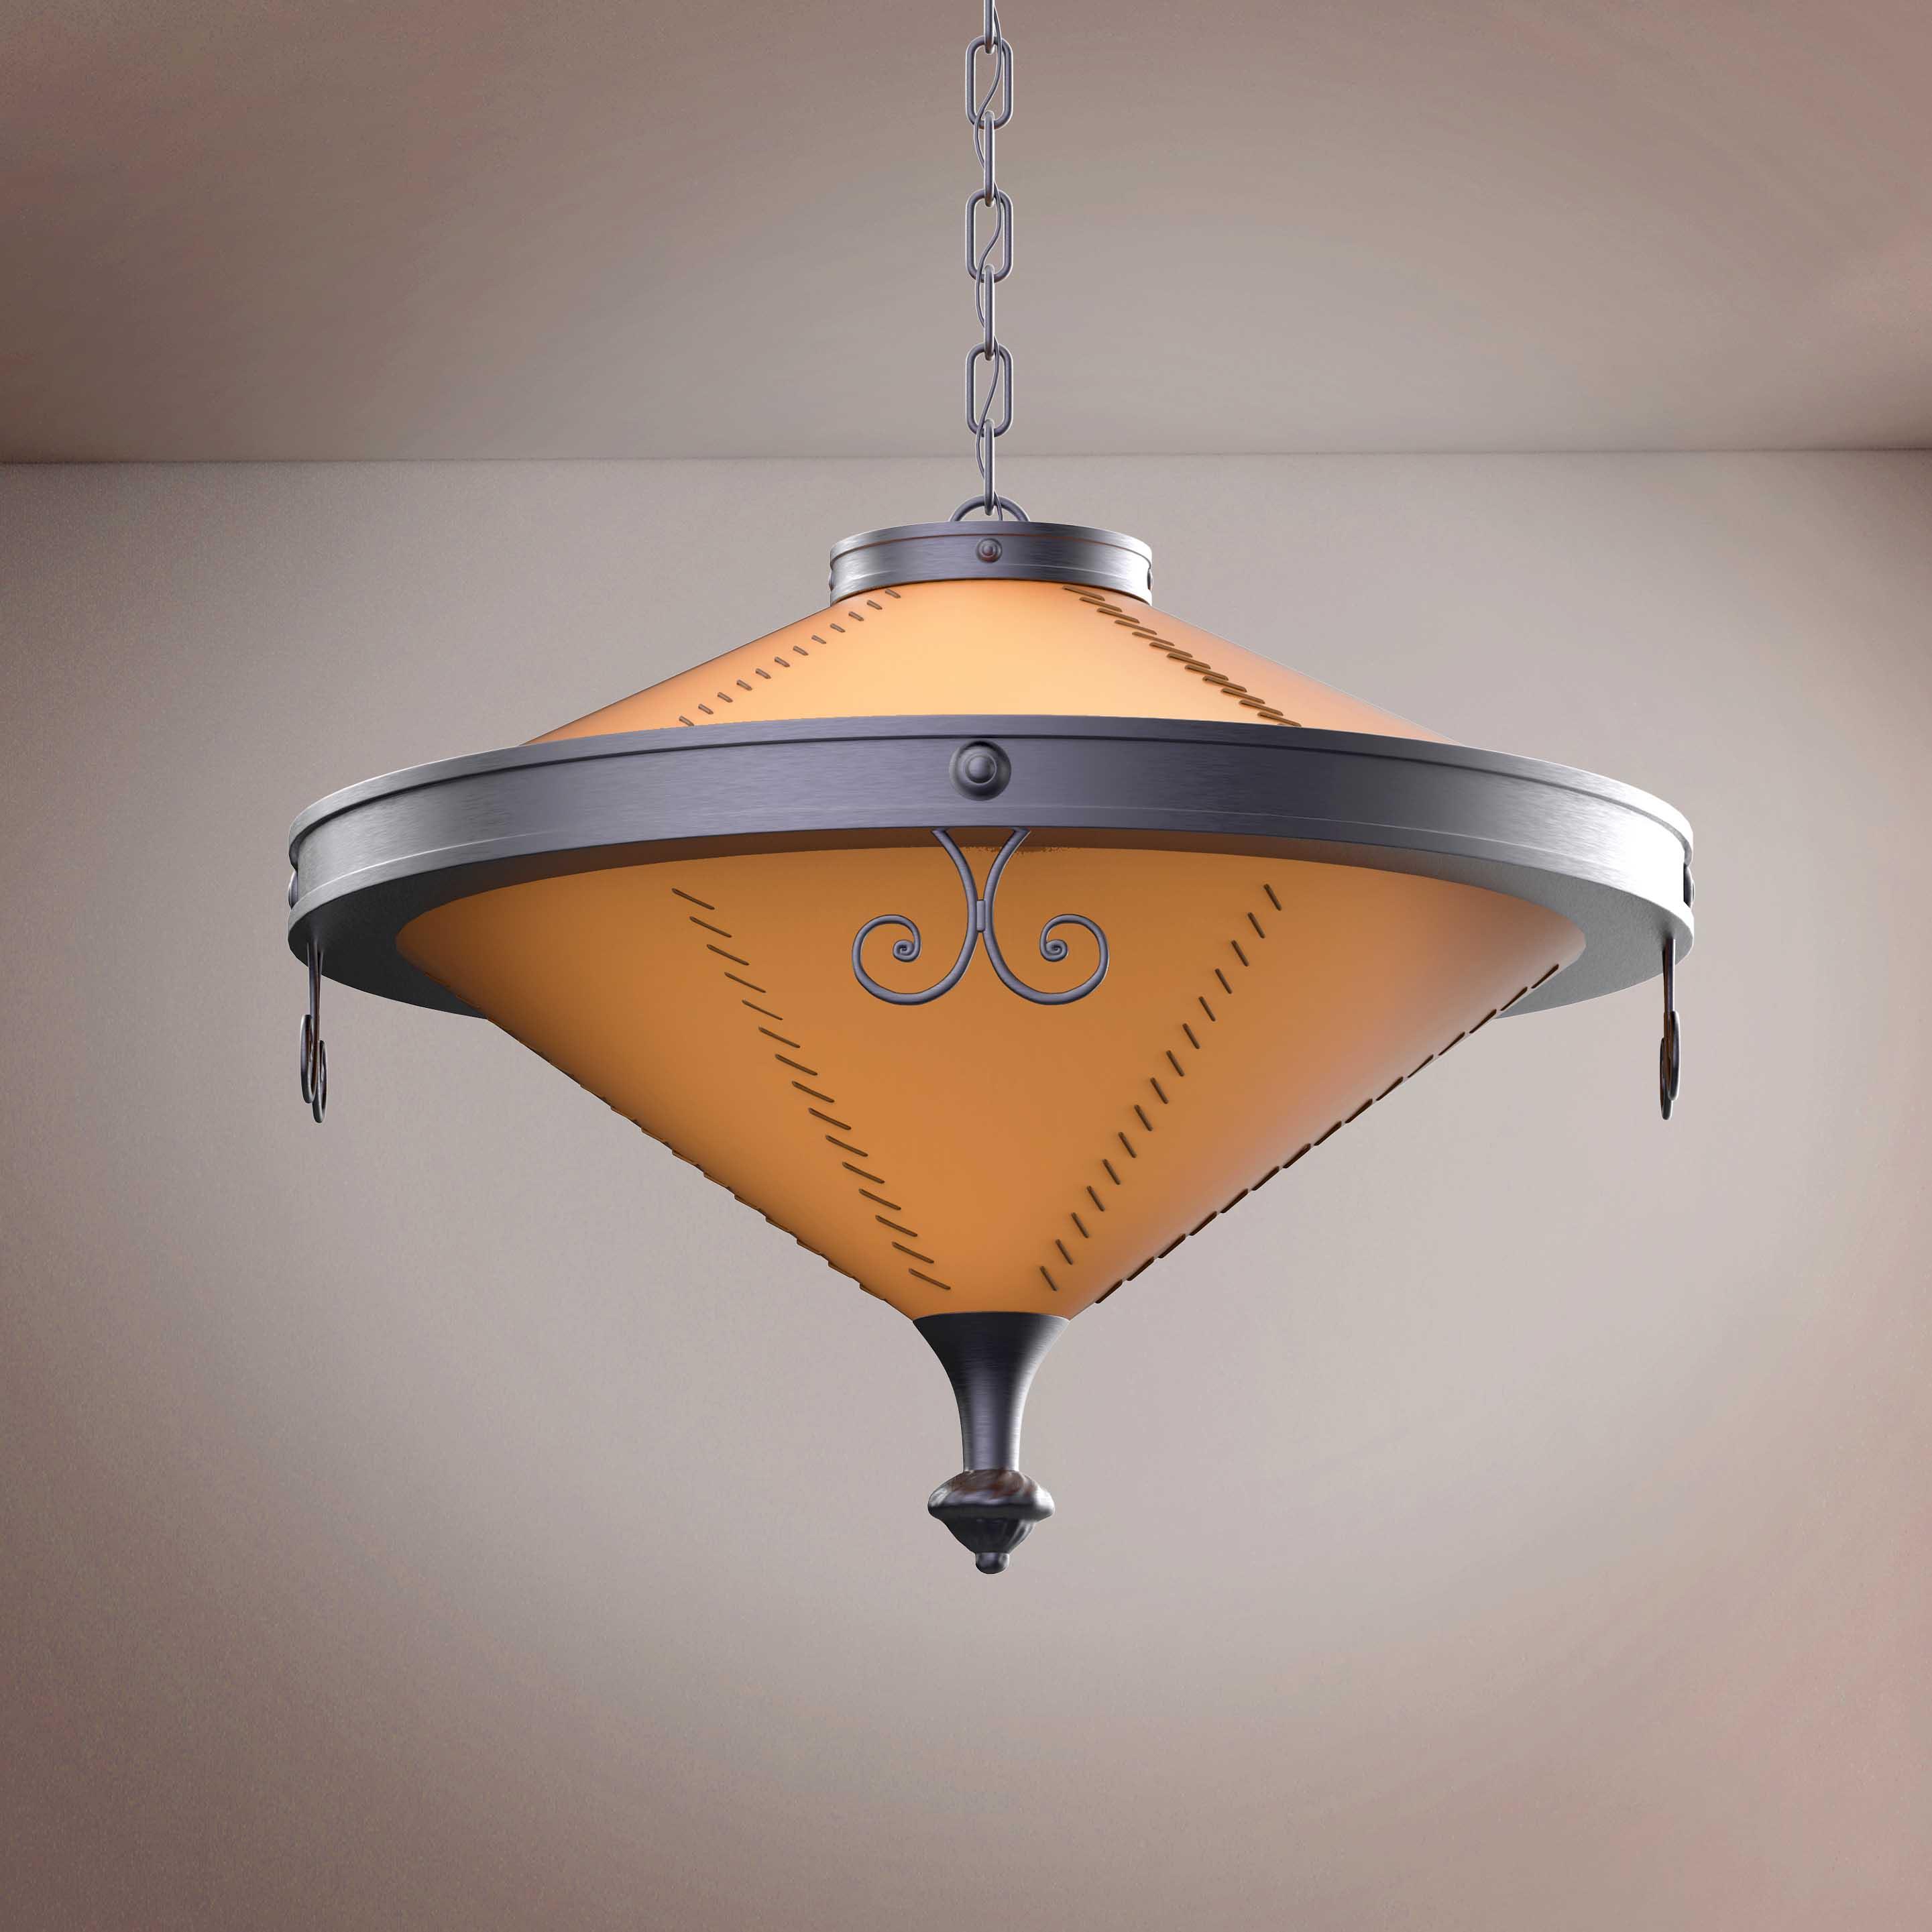 Vintage Round Ornament Chandelier - 3D Product